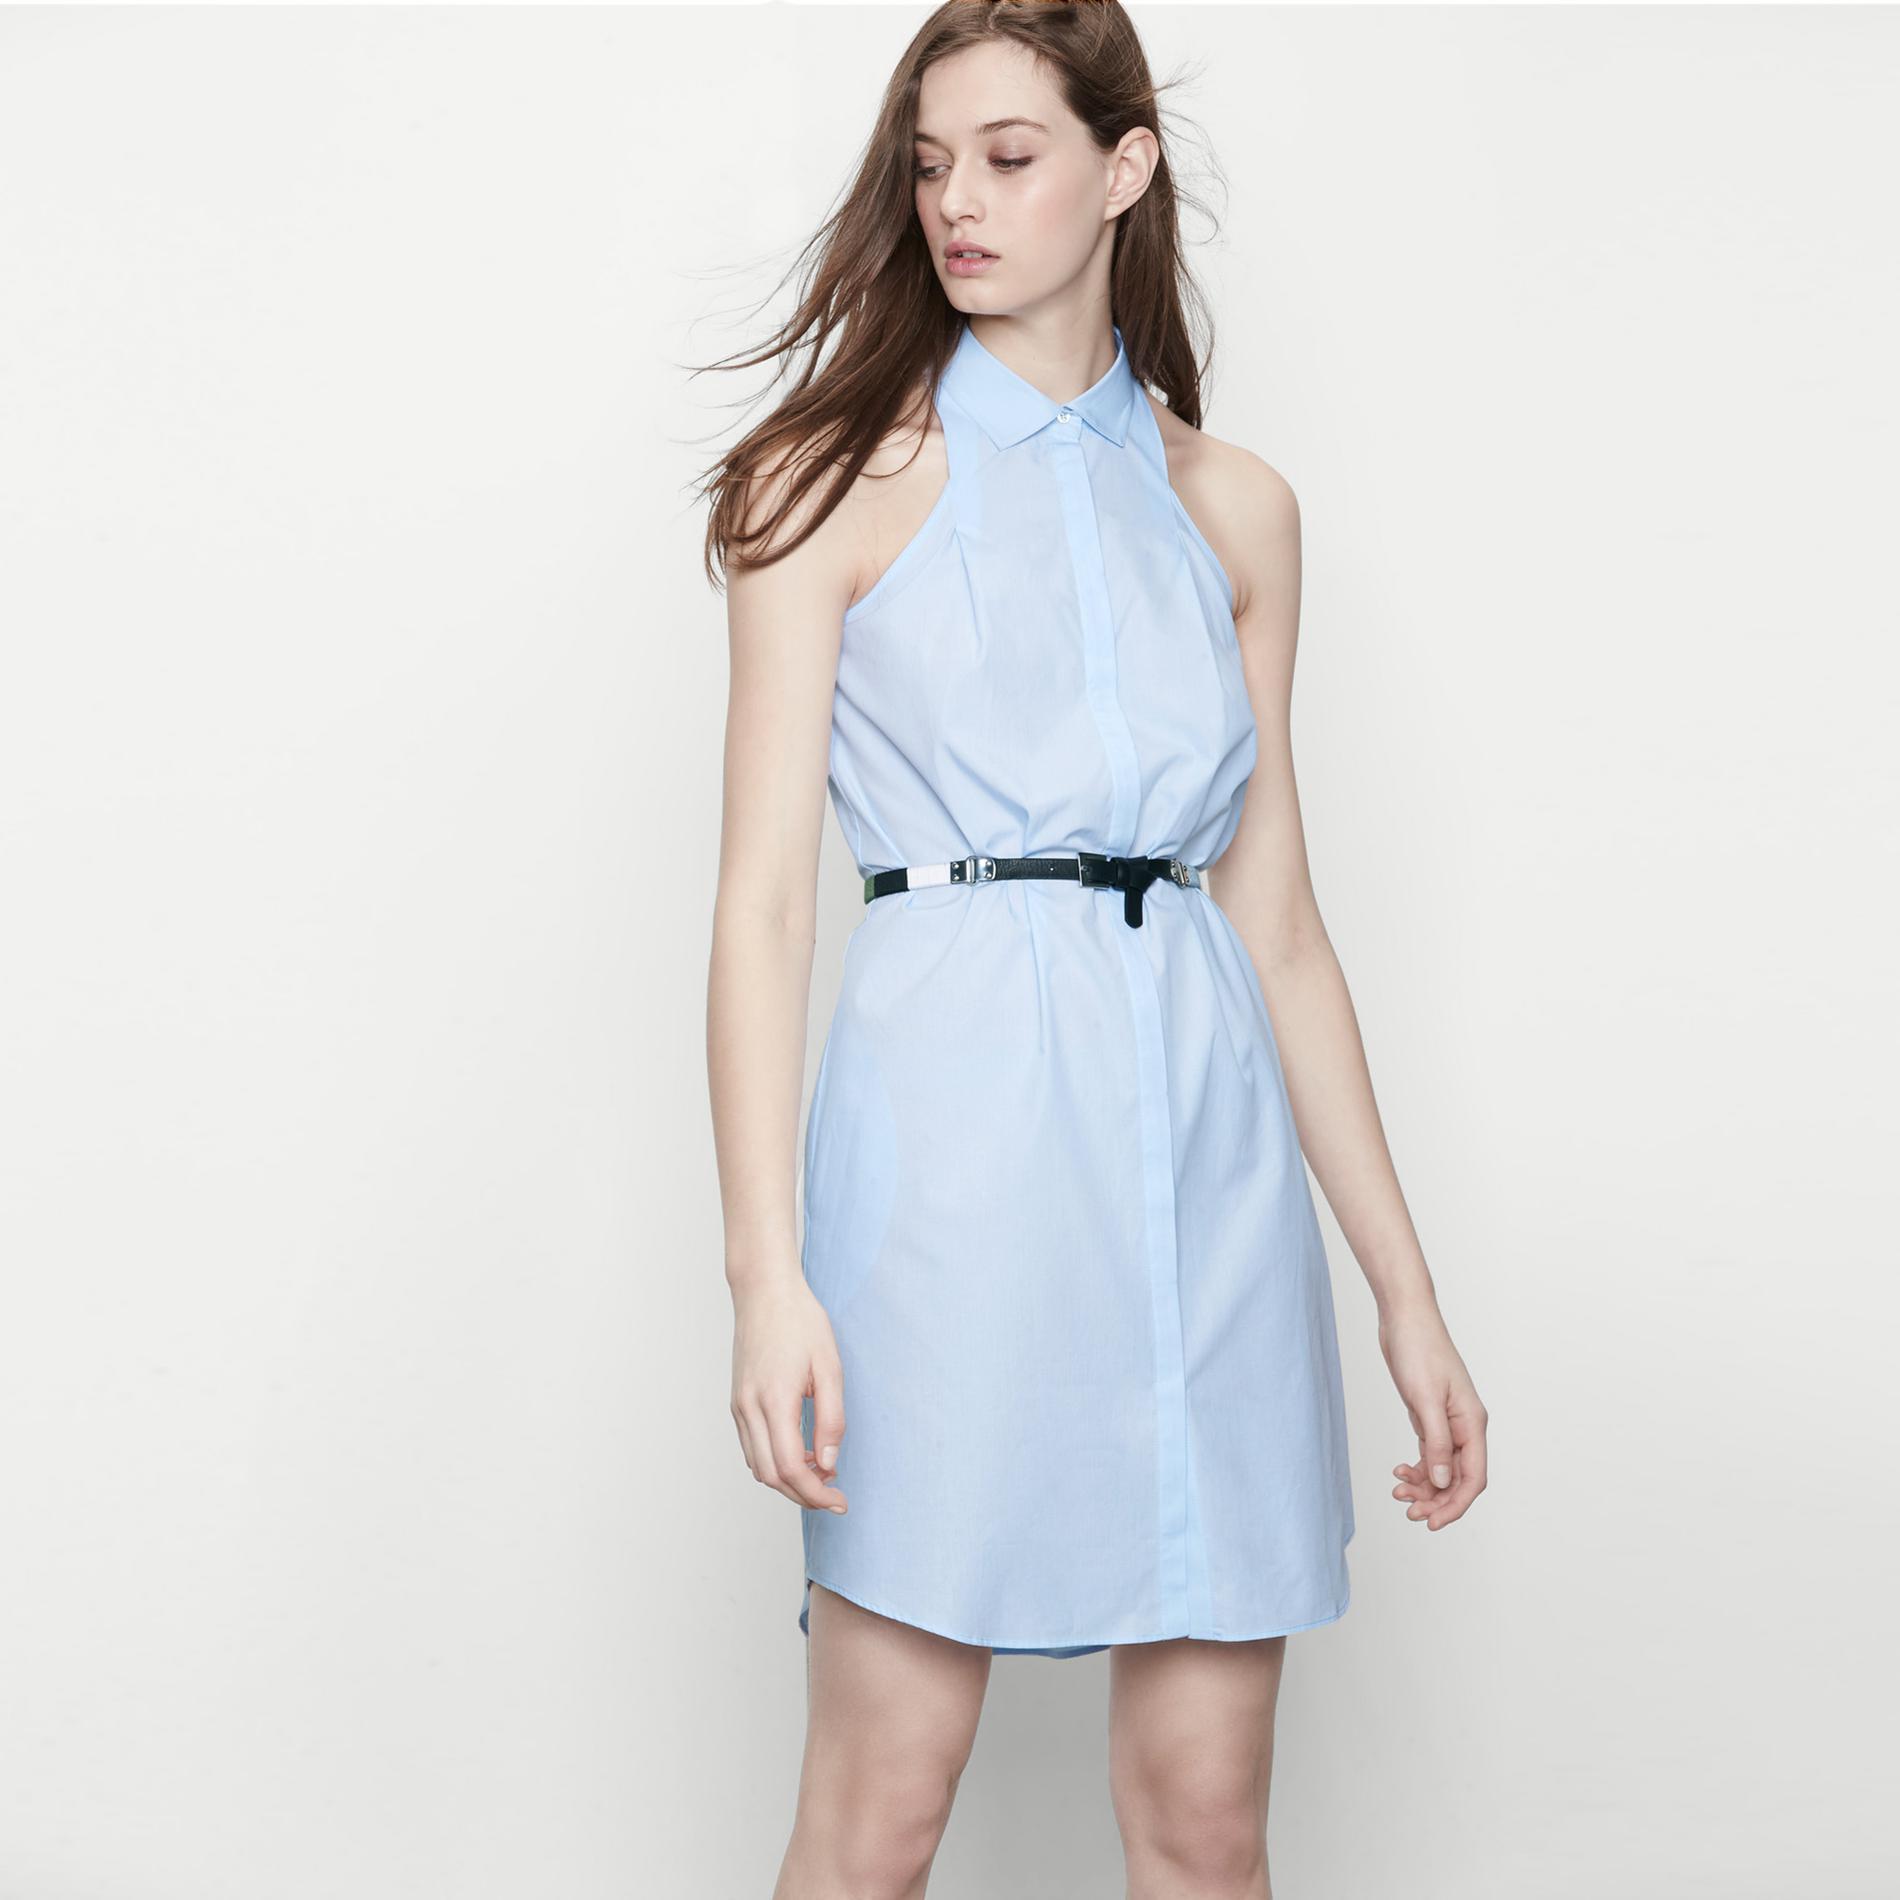 la-robe-chemise-selon-photo-11